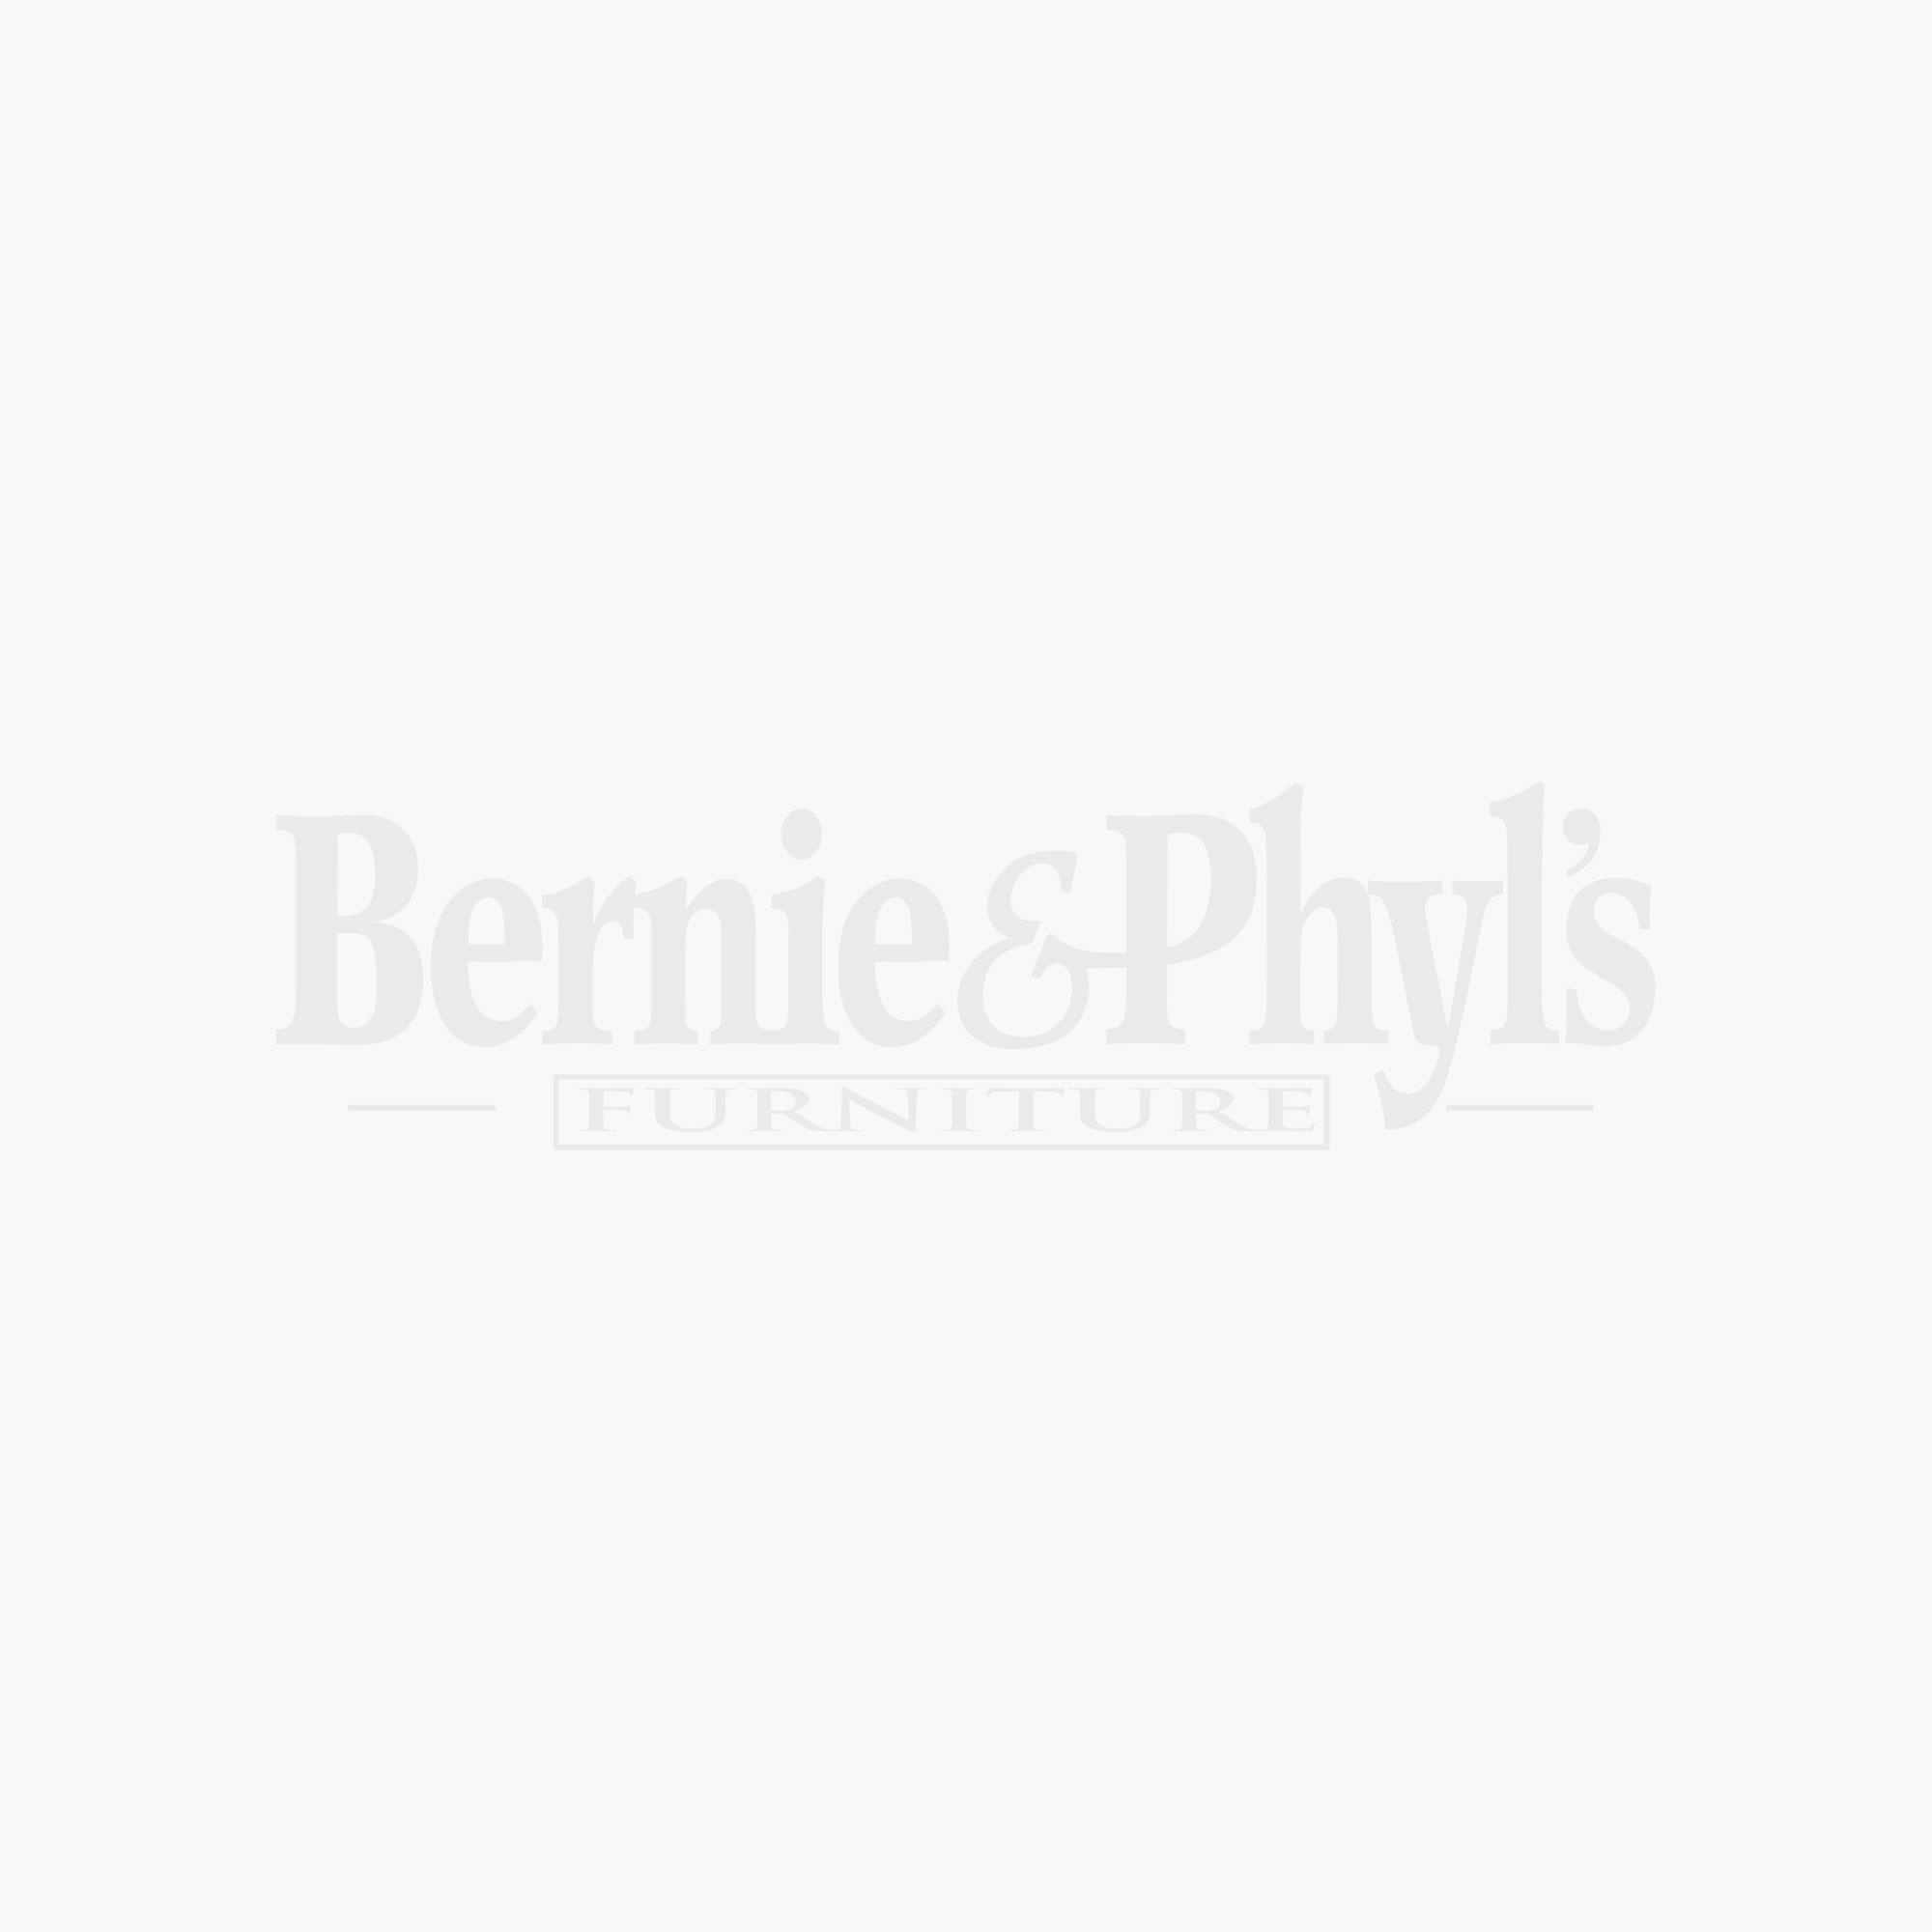 Pebble Chocolate Power Recliner  sc 1 st  Bernie u0026 Phylu0027s Furniture & Recliner Chairs | Leather Recliners | Rocker Swivel Recliners ... islam-shia.org